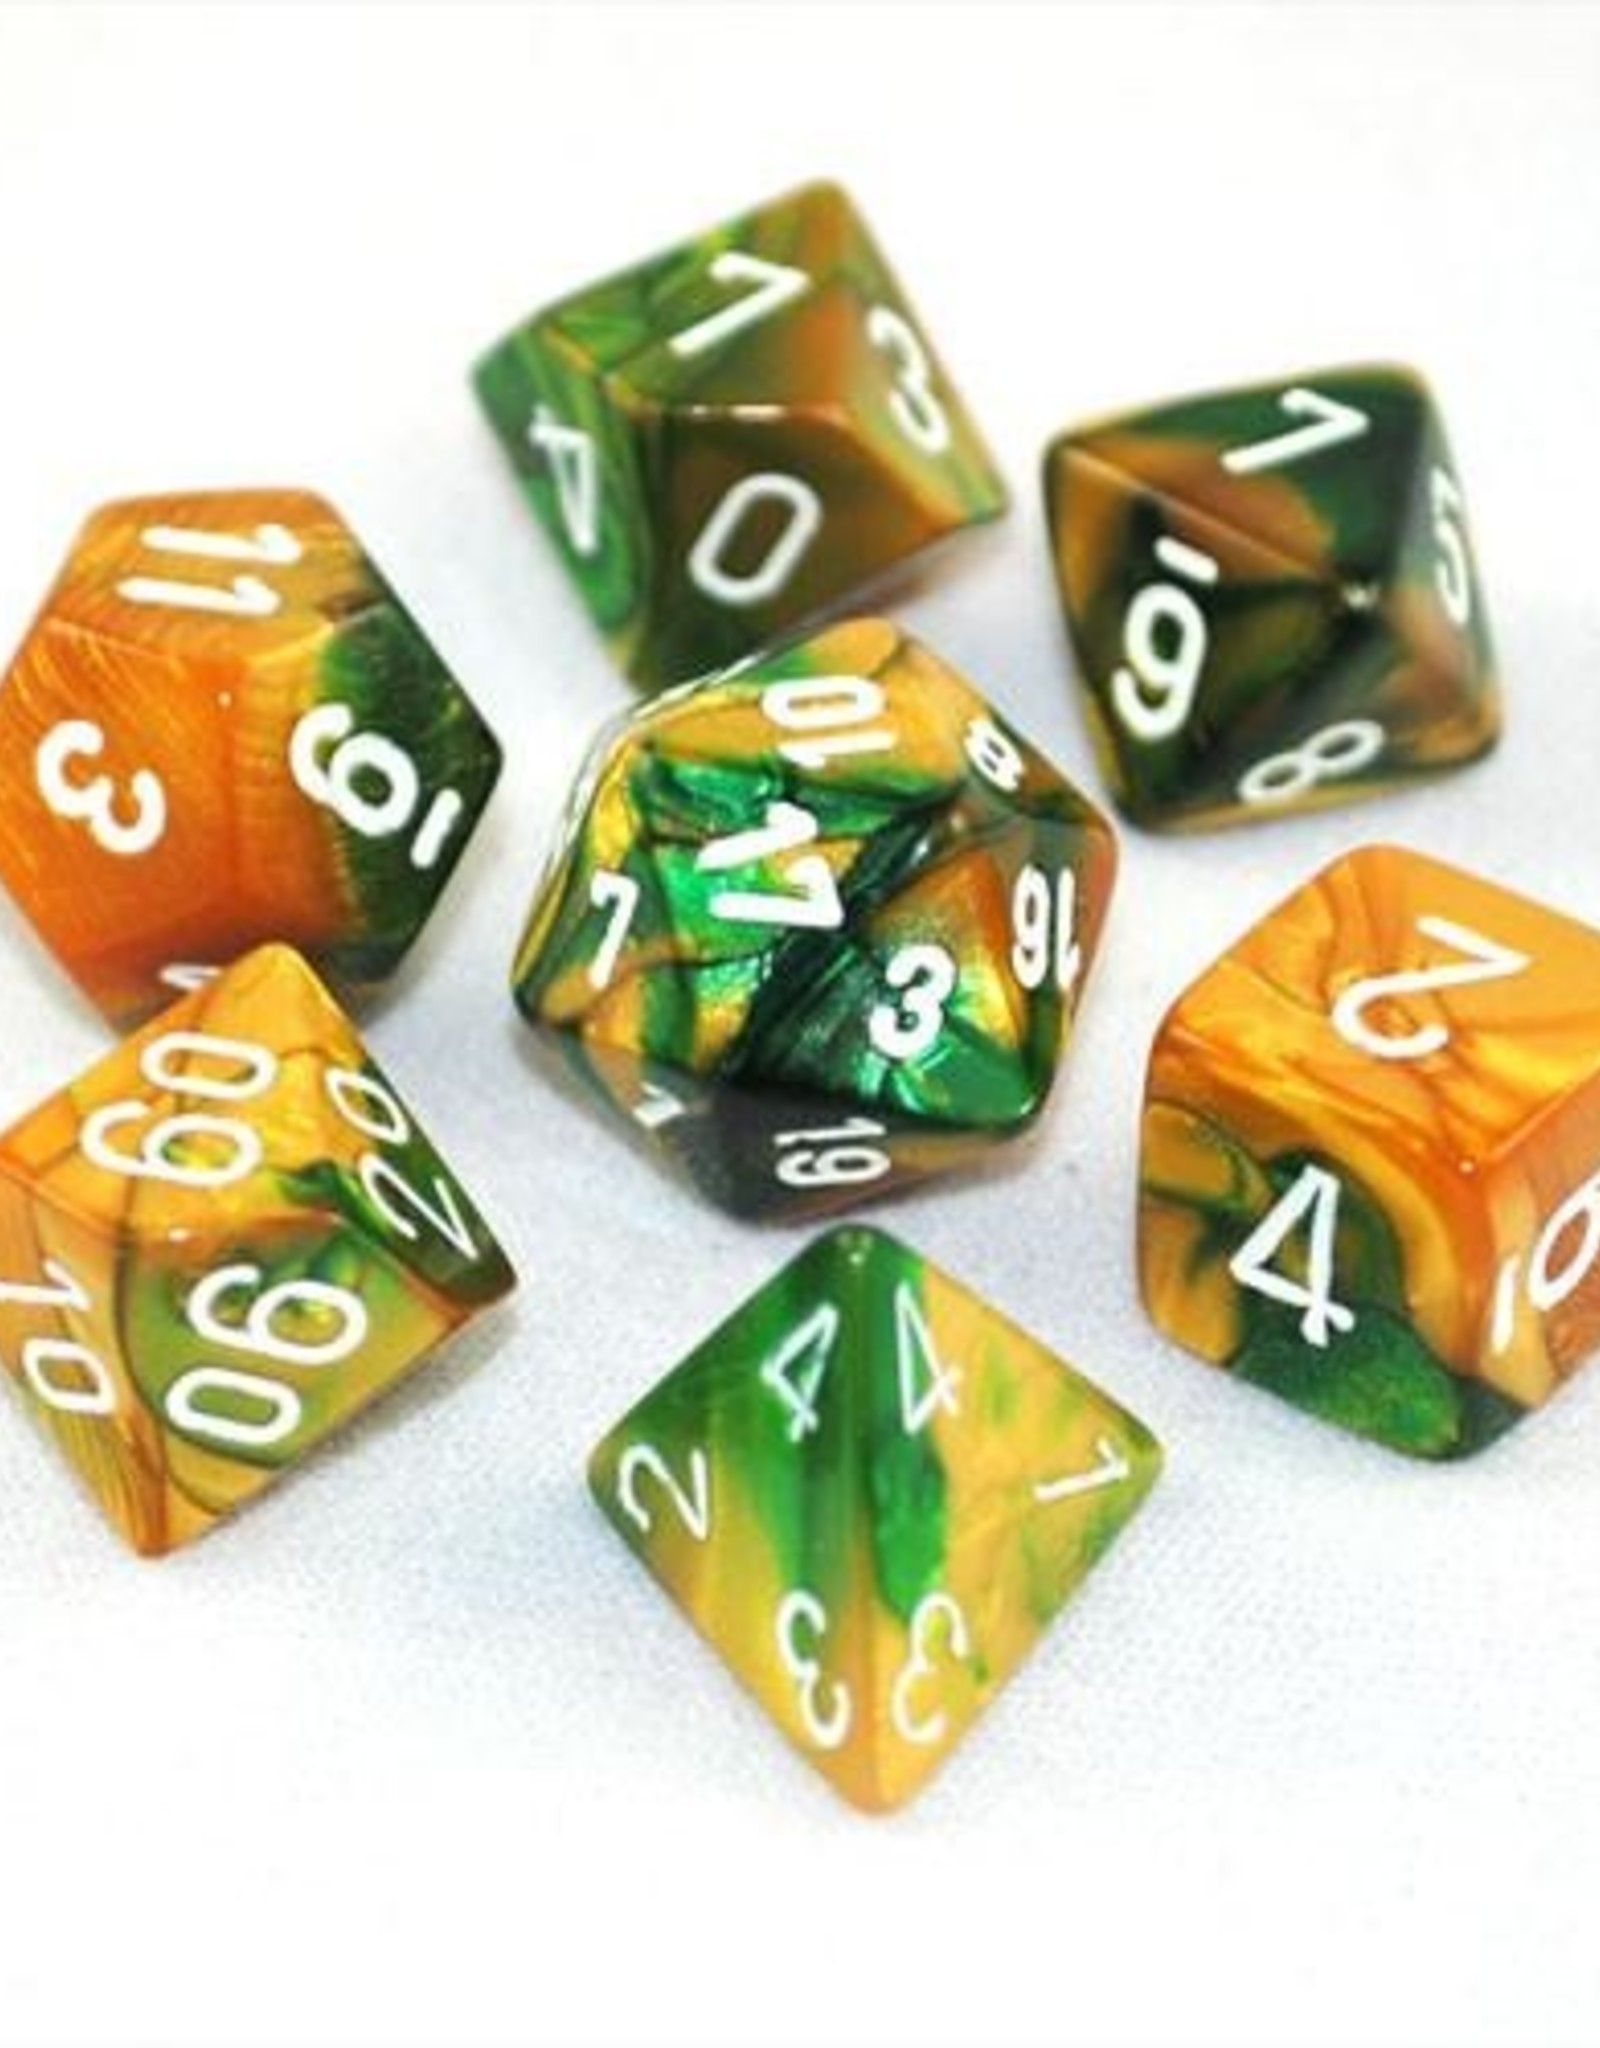 Chessex Chessex 7-Die set Gemini - Gold-Green/White